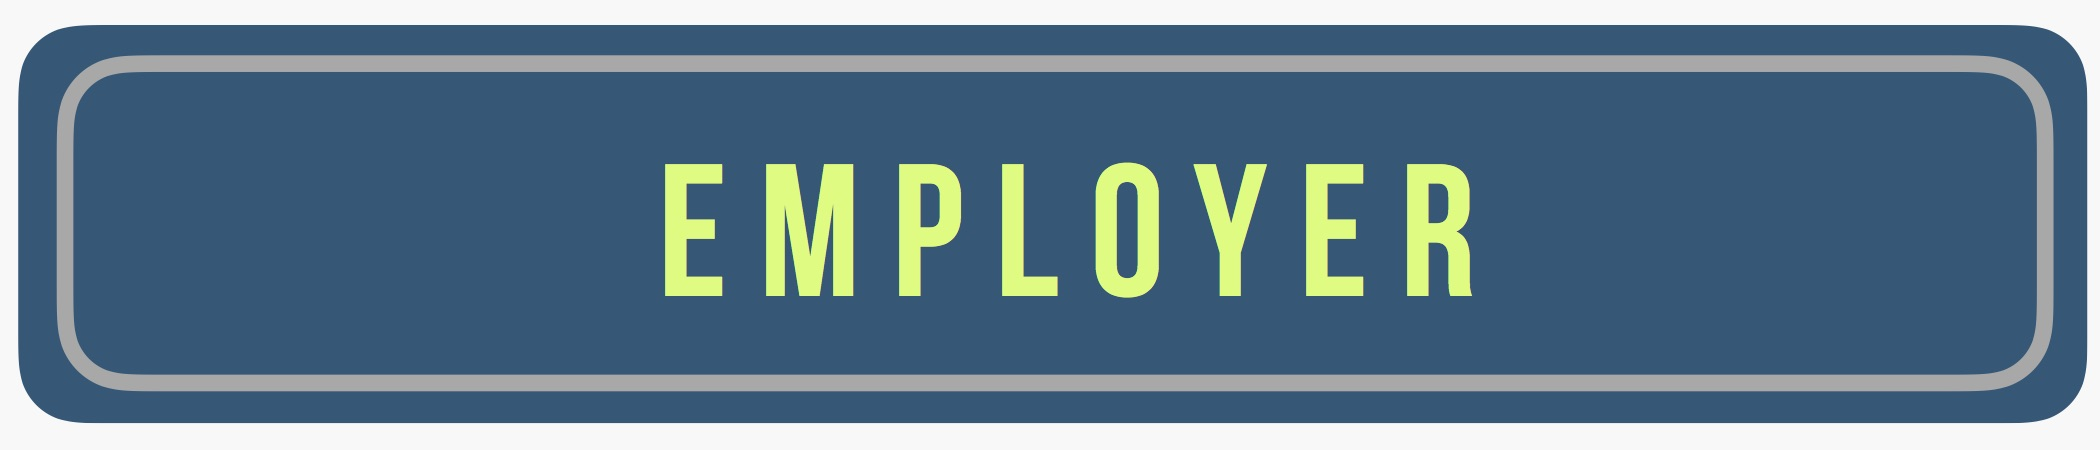 Employer copy.jpg